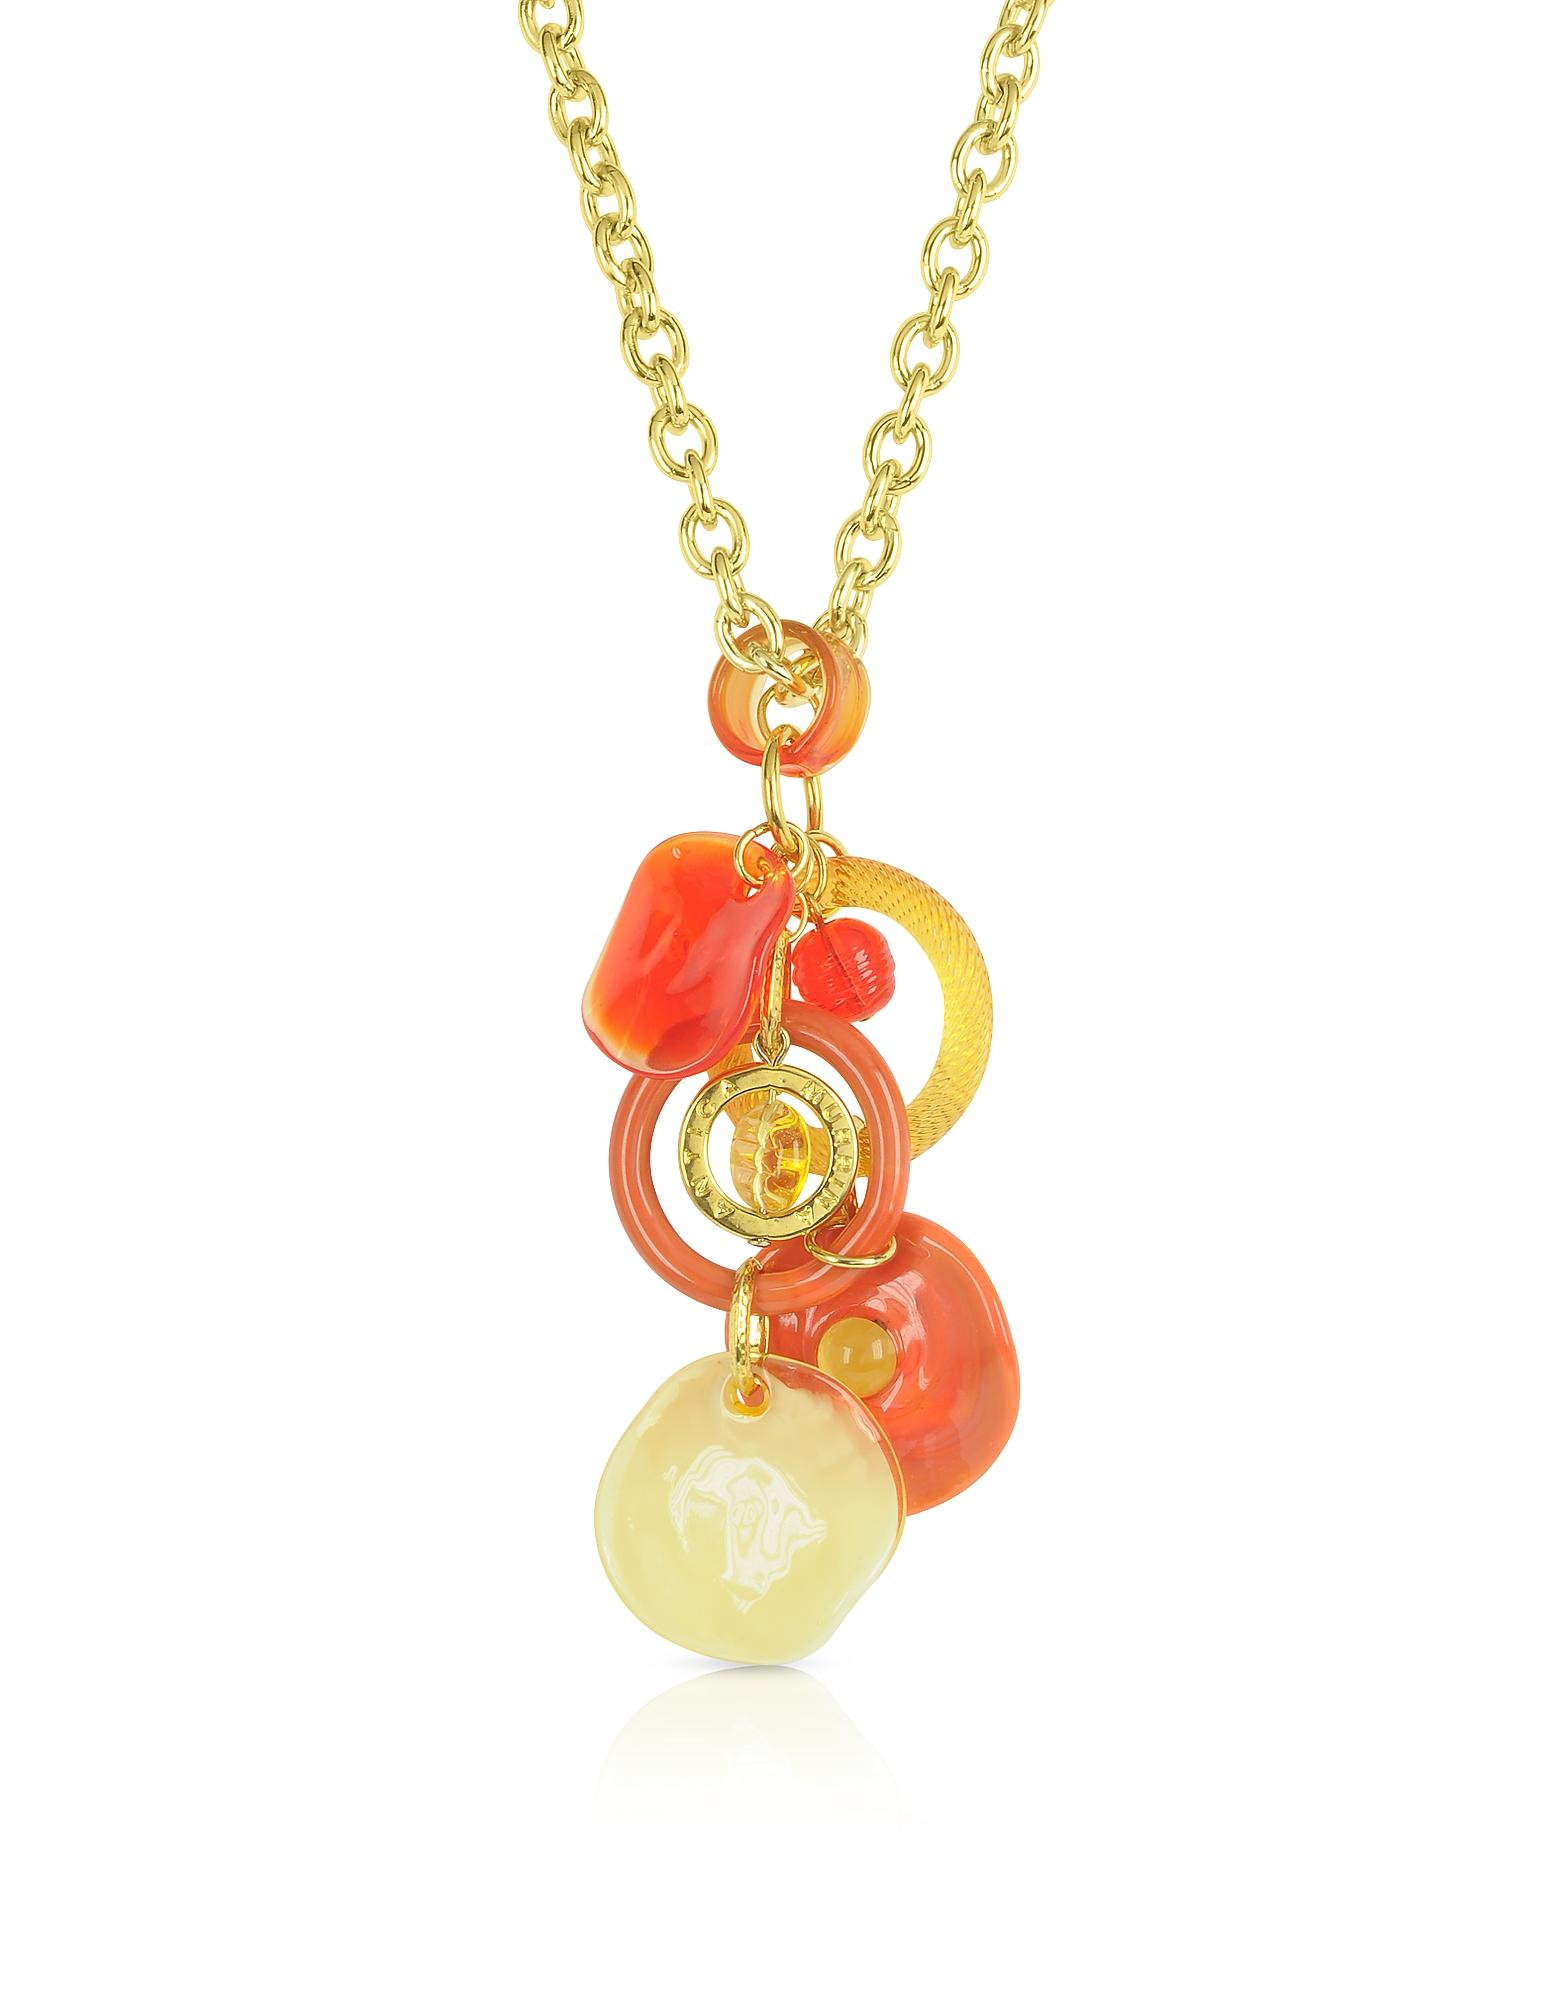 Shiva - Ожерелье с Чармами из Стекла Мурано